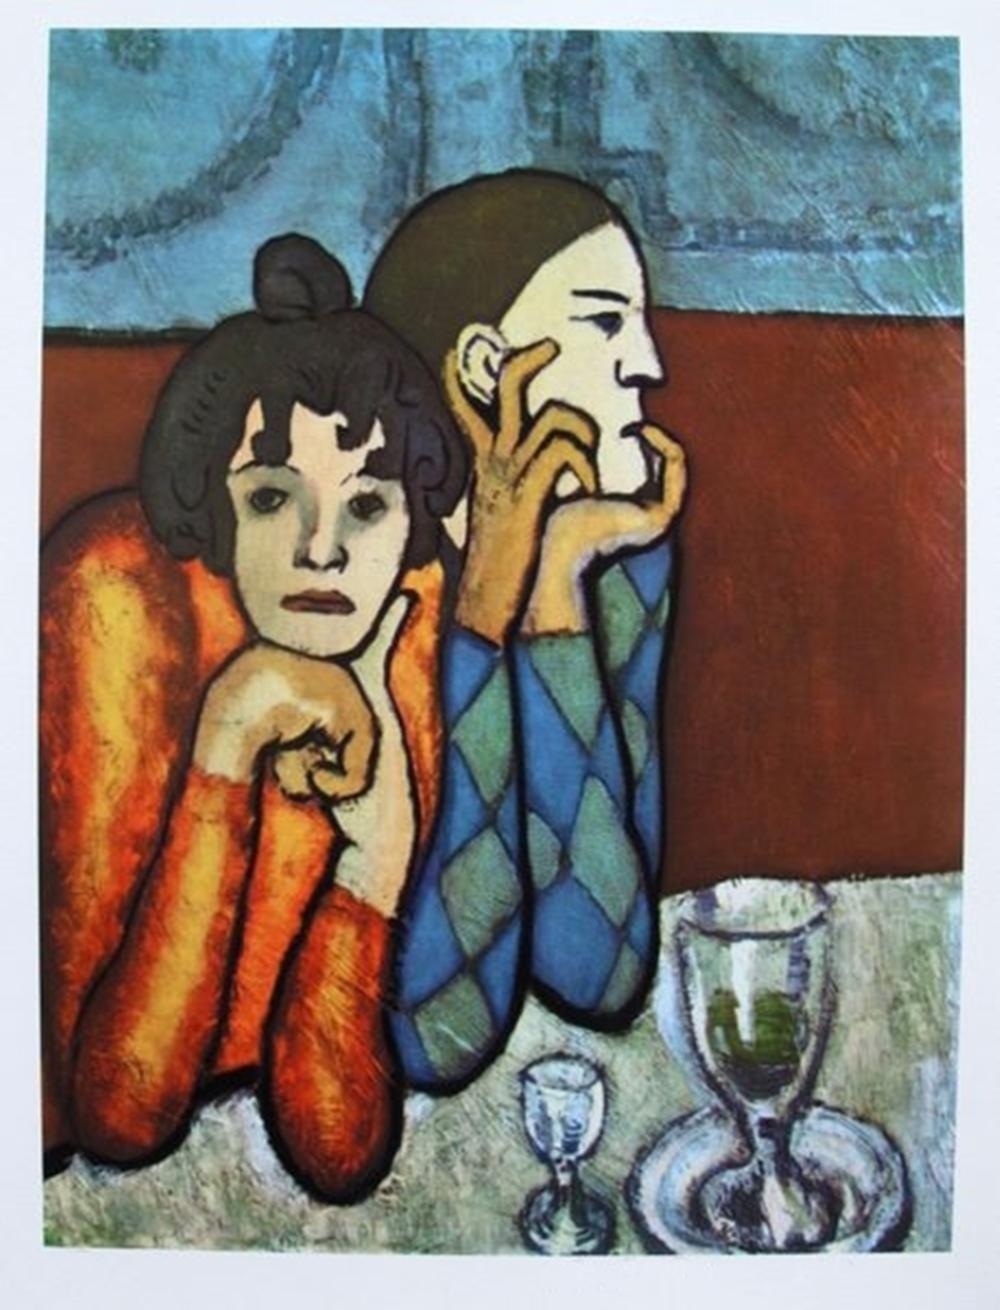 Pablo Picasso Harlequin And His Companion Pablo picasso